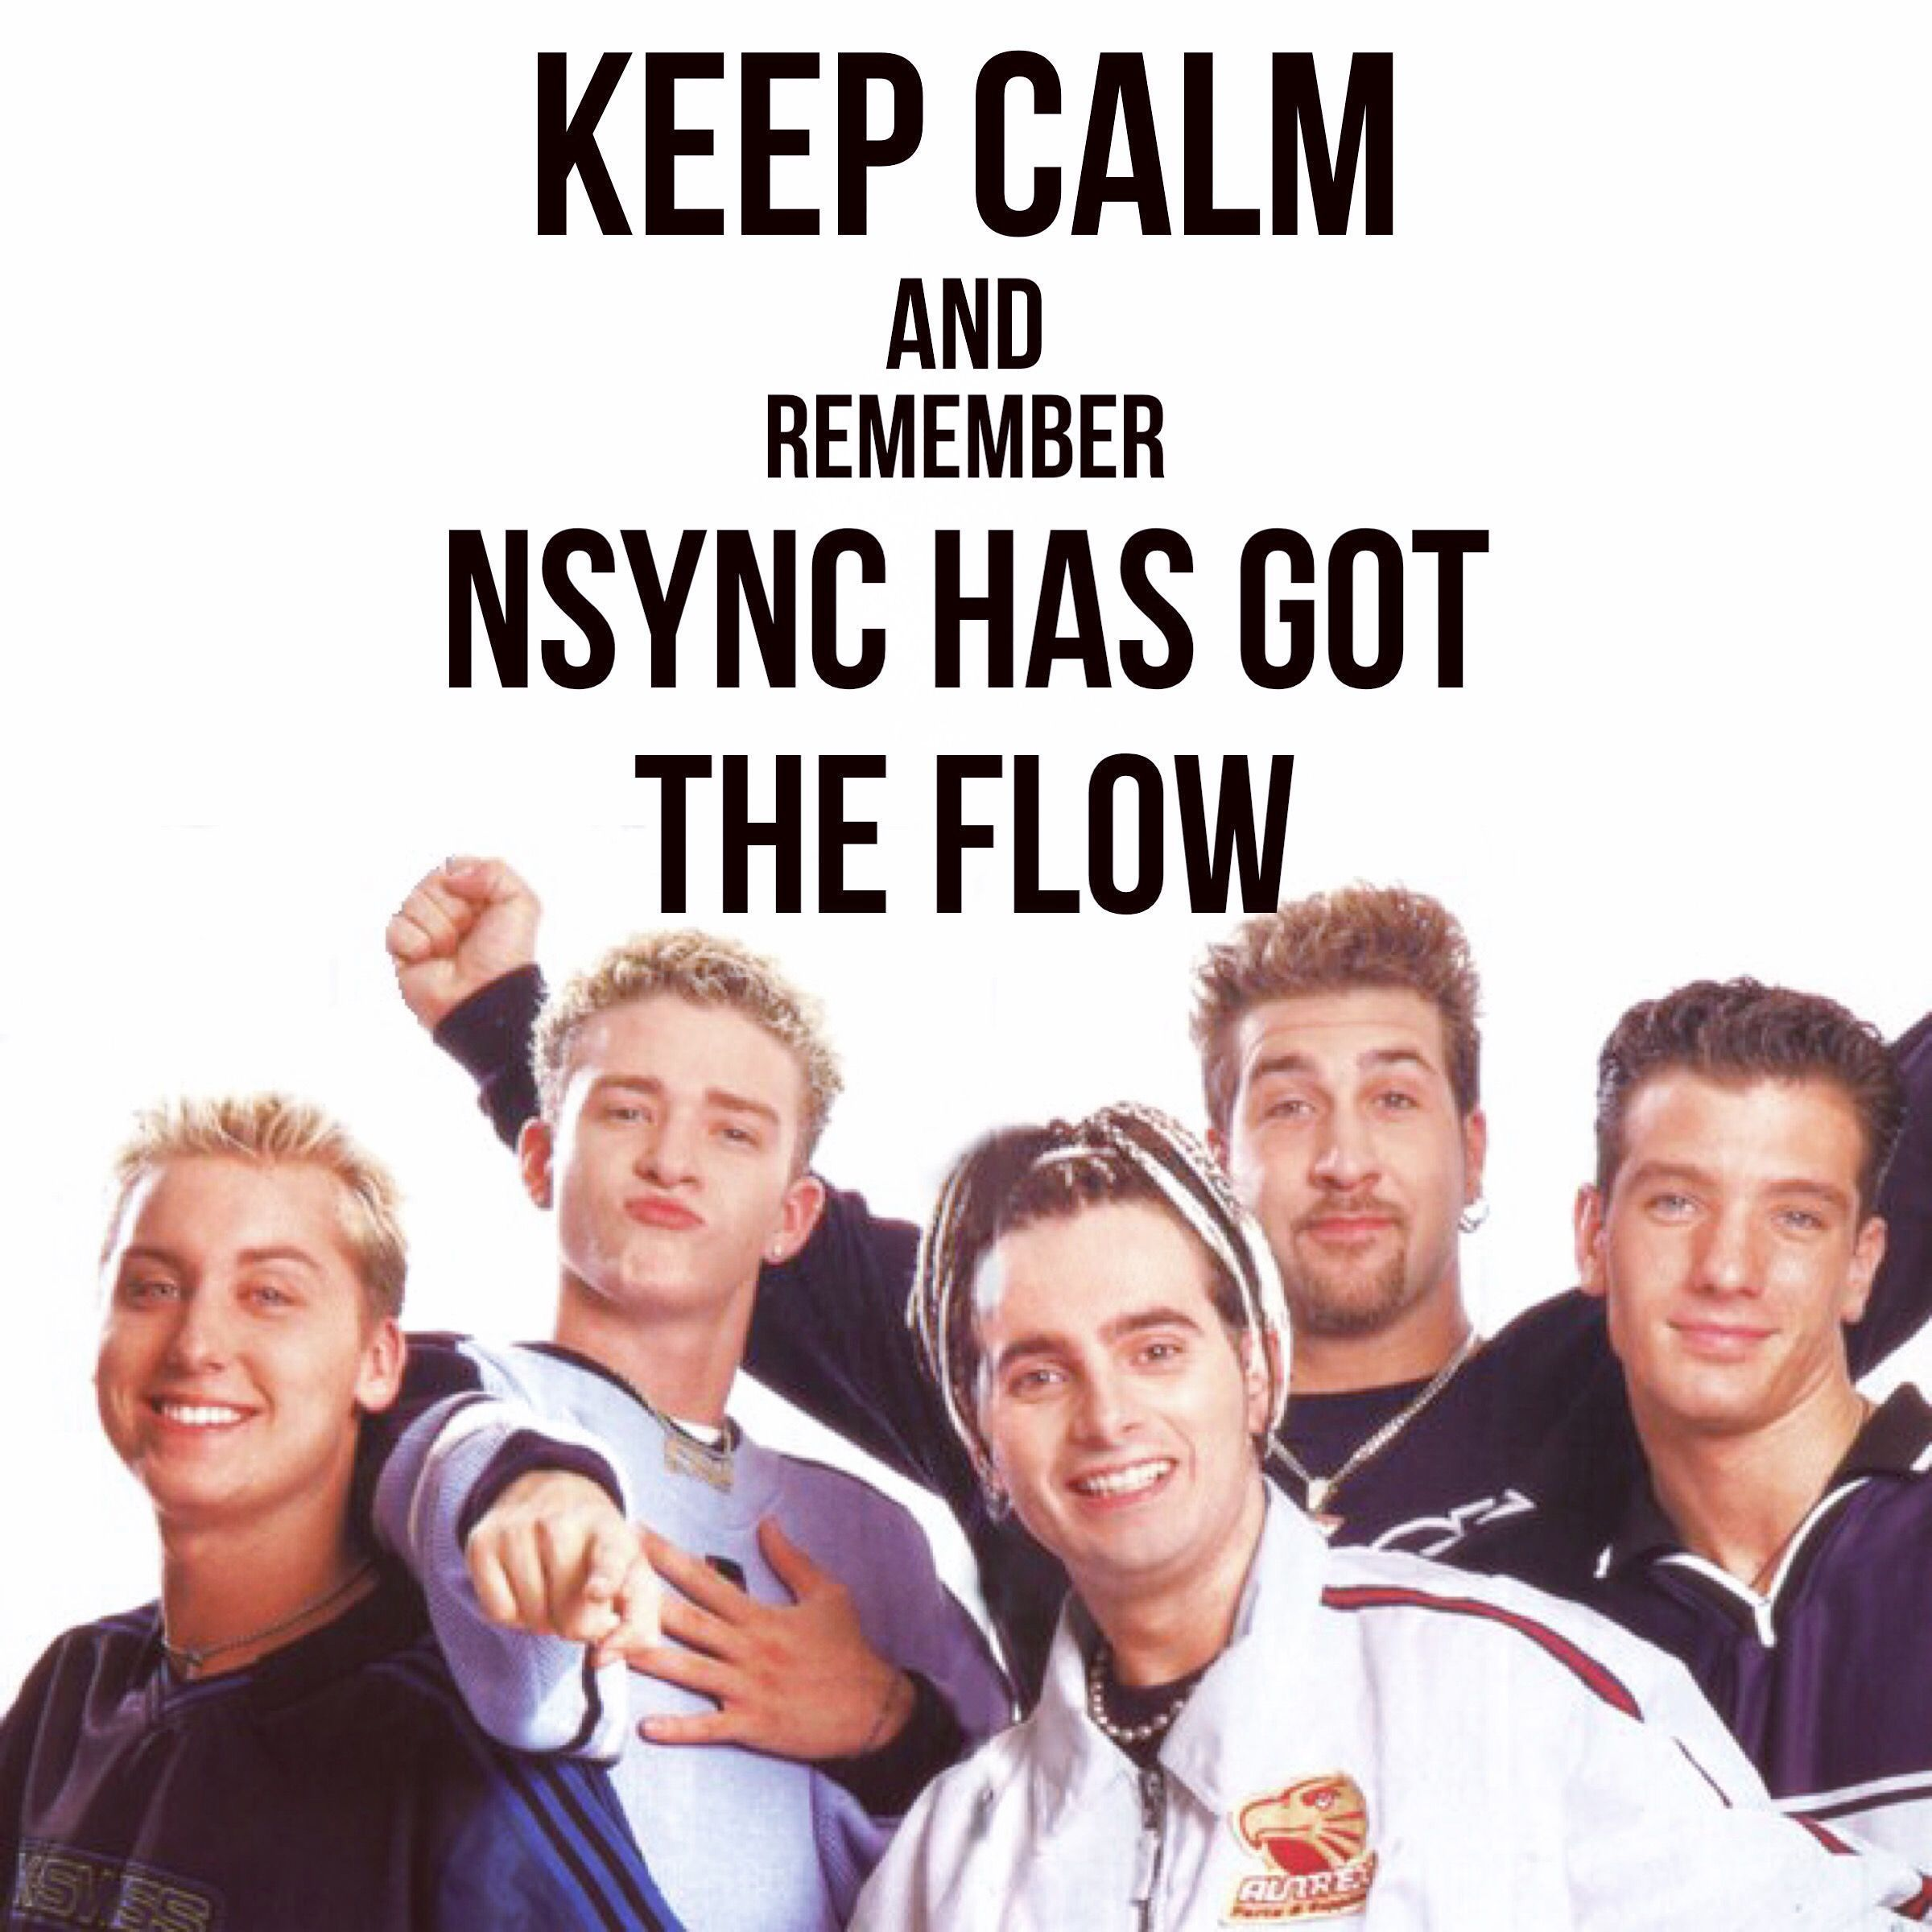 Nsync Bachelorette Party Nsync Nsync Nsync 90s Nsync Wallpaper Nsync Meme Nsync Christmas Nsync Svg Nsync Costume In 2020 Nsync Meme Nsync Bachelorette